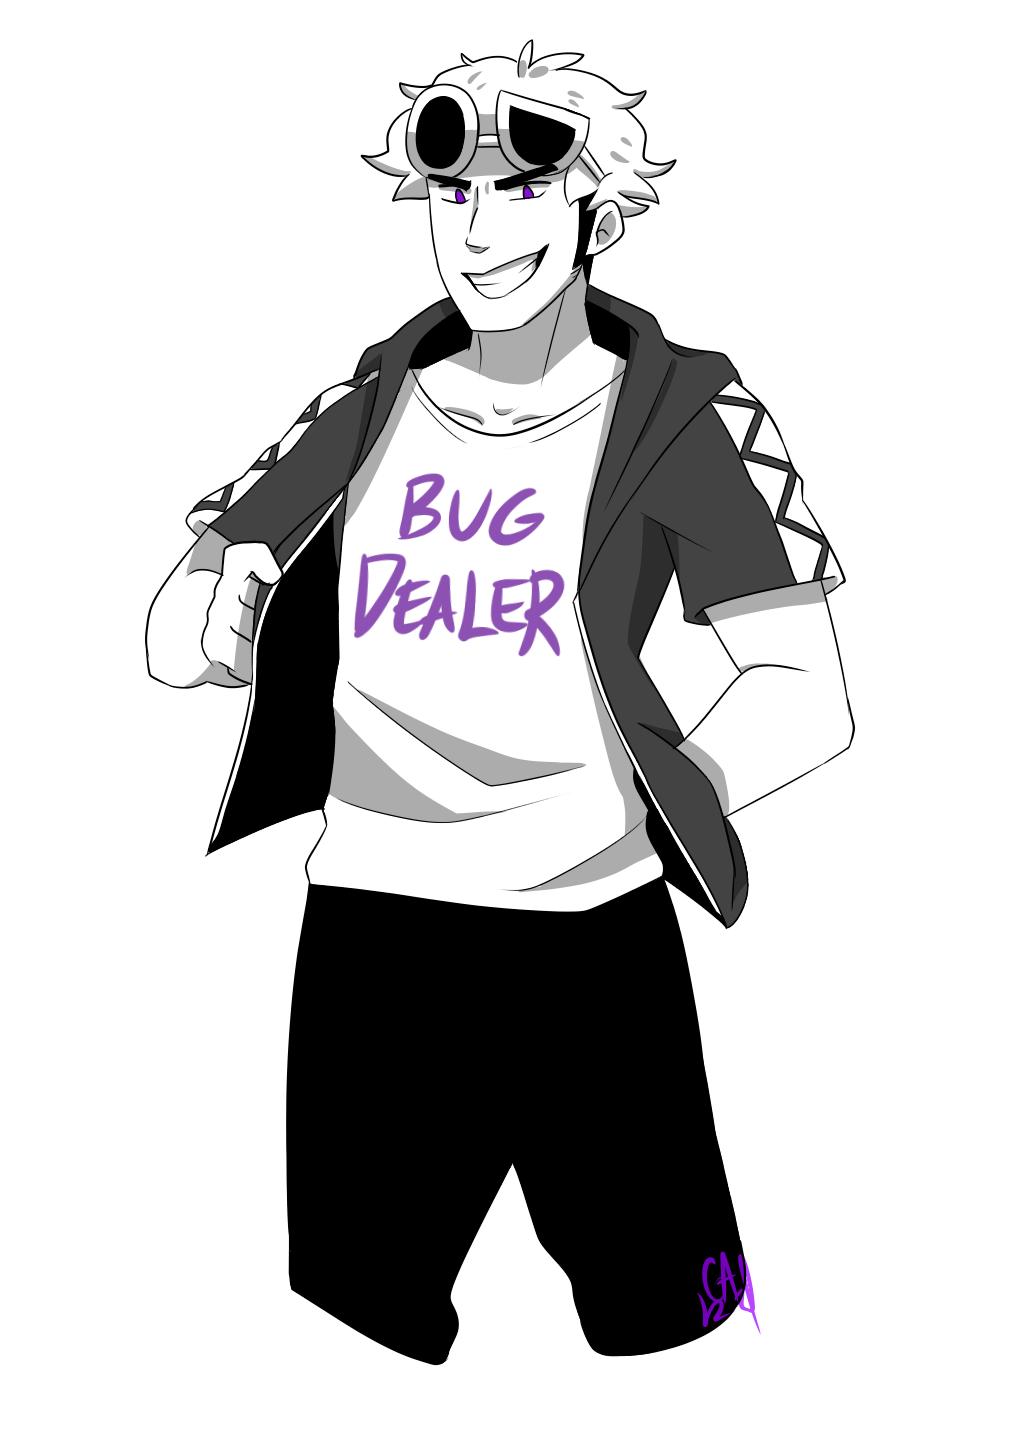 Bug dealer by Gameaddict1234